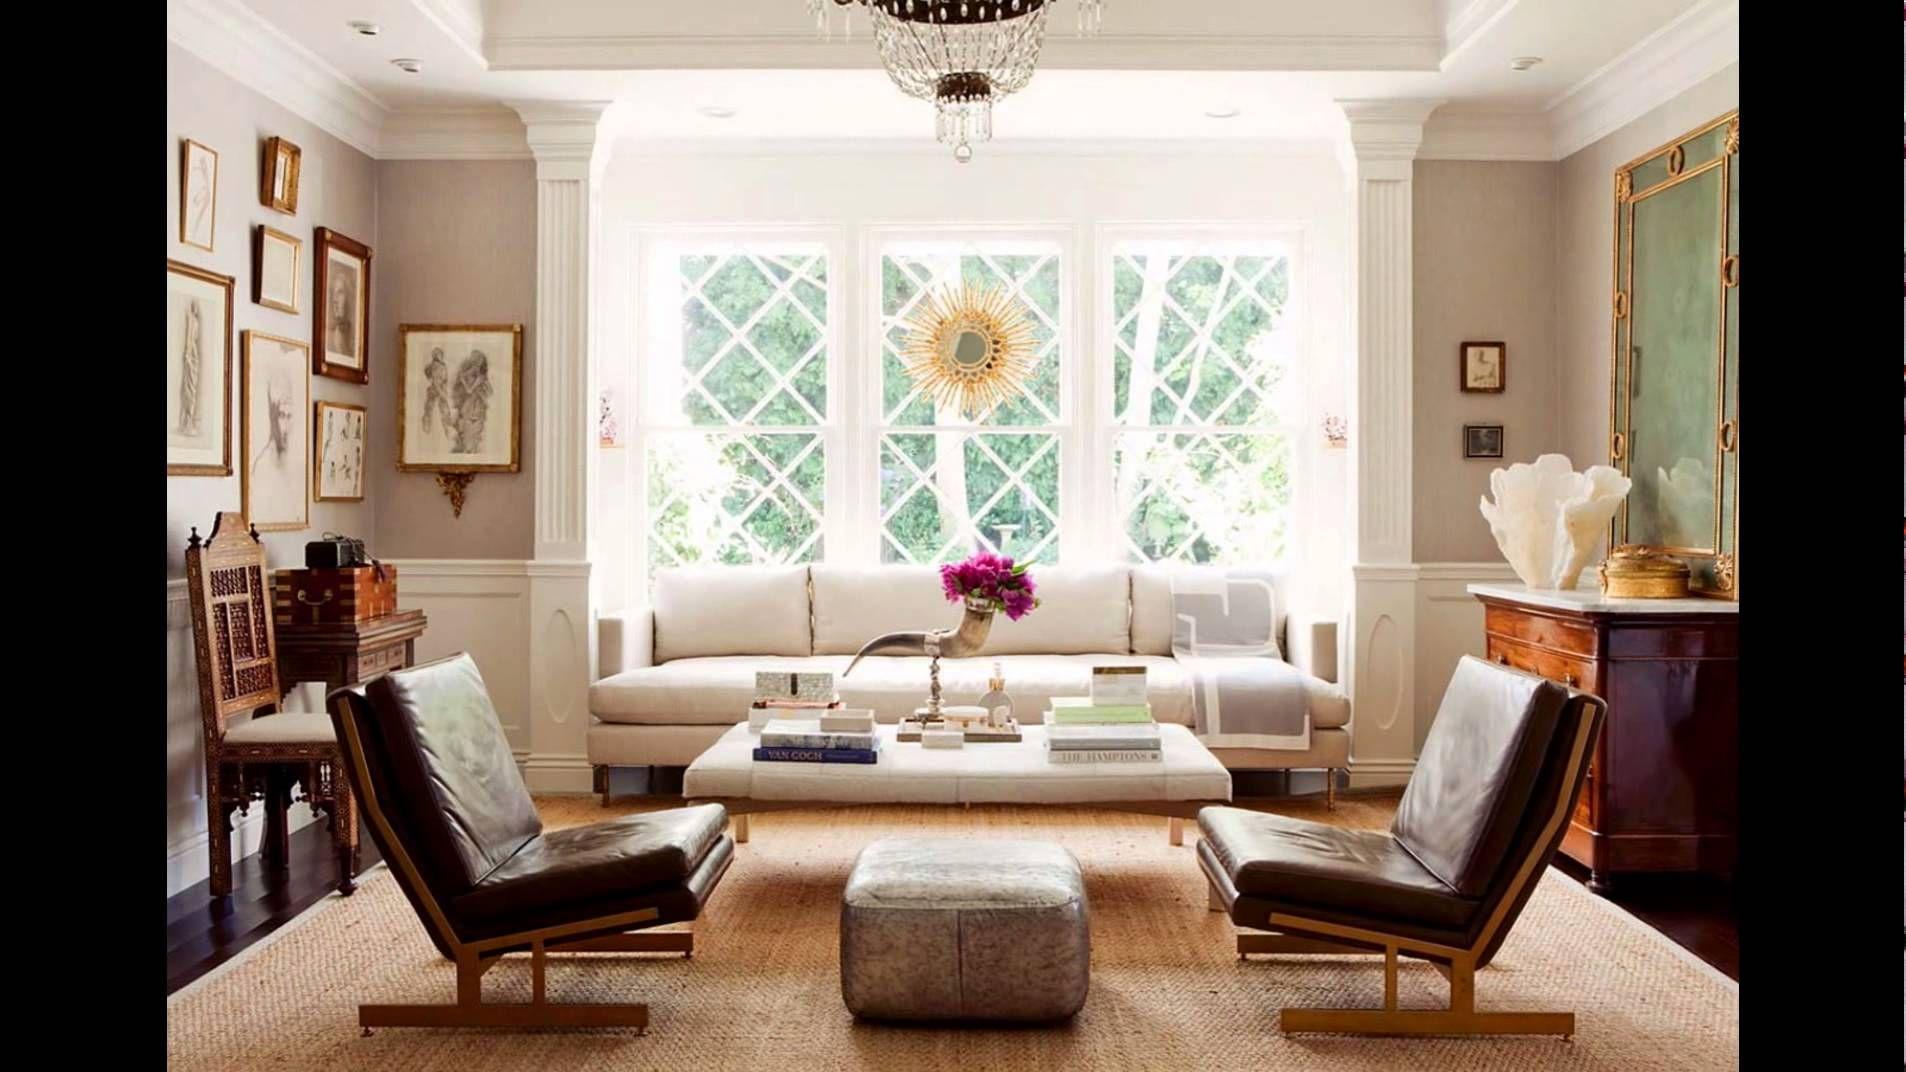 80 Living Room Ideas Ikea Living Room Corner Fireplace Furniture Arrangement Interior Design